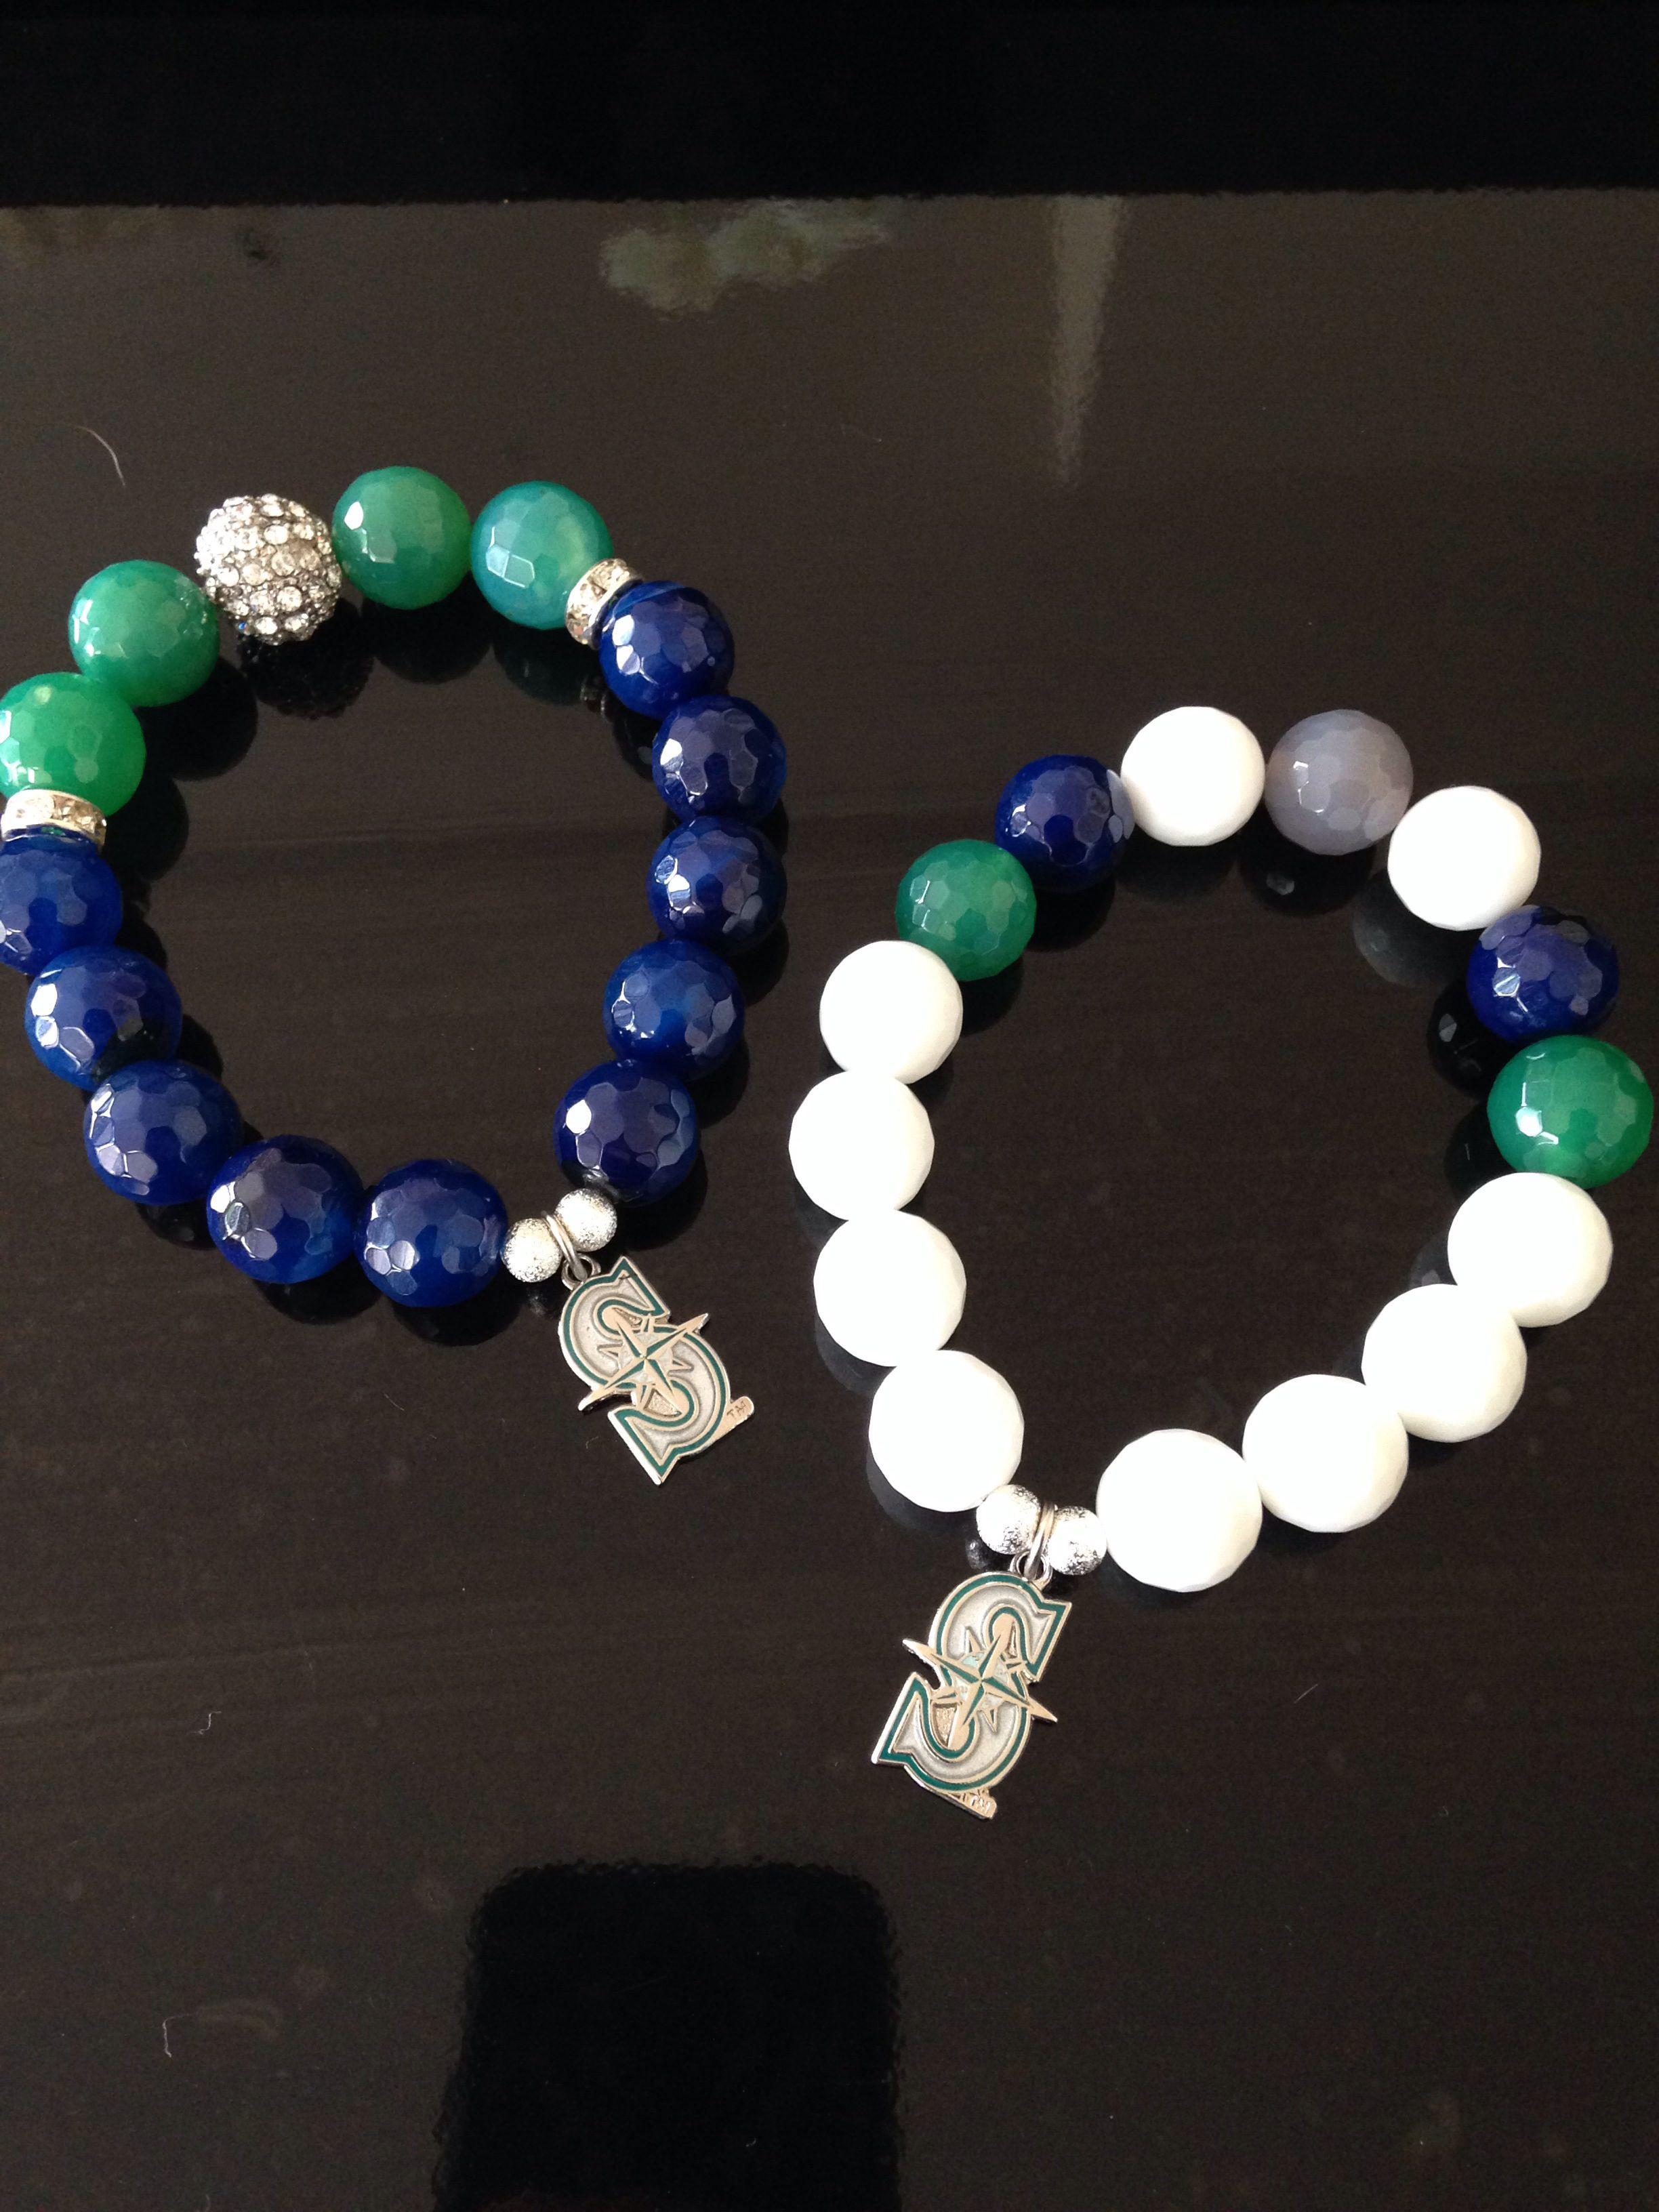 Mariner sports bracelets